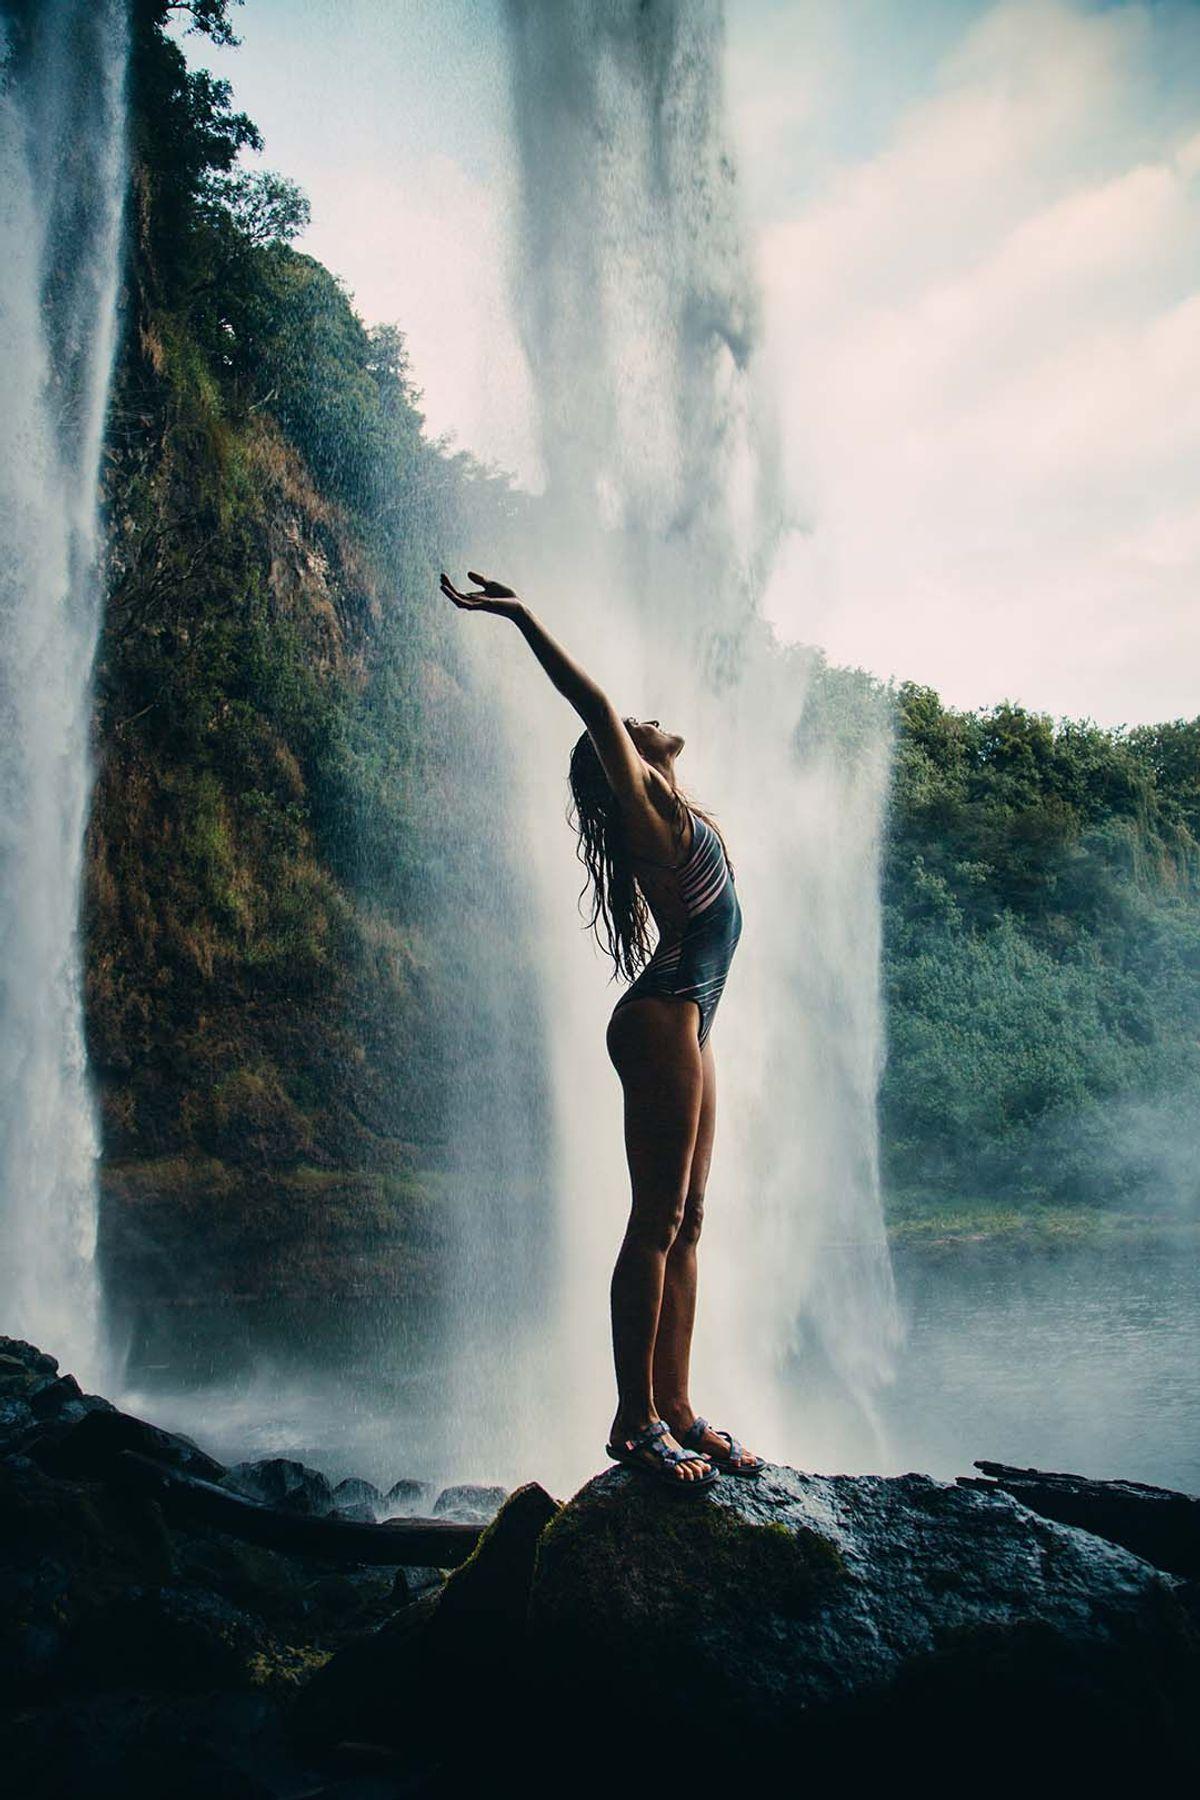 A Spiritual Bucket List For Every Young Adventurer